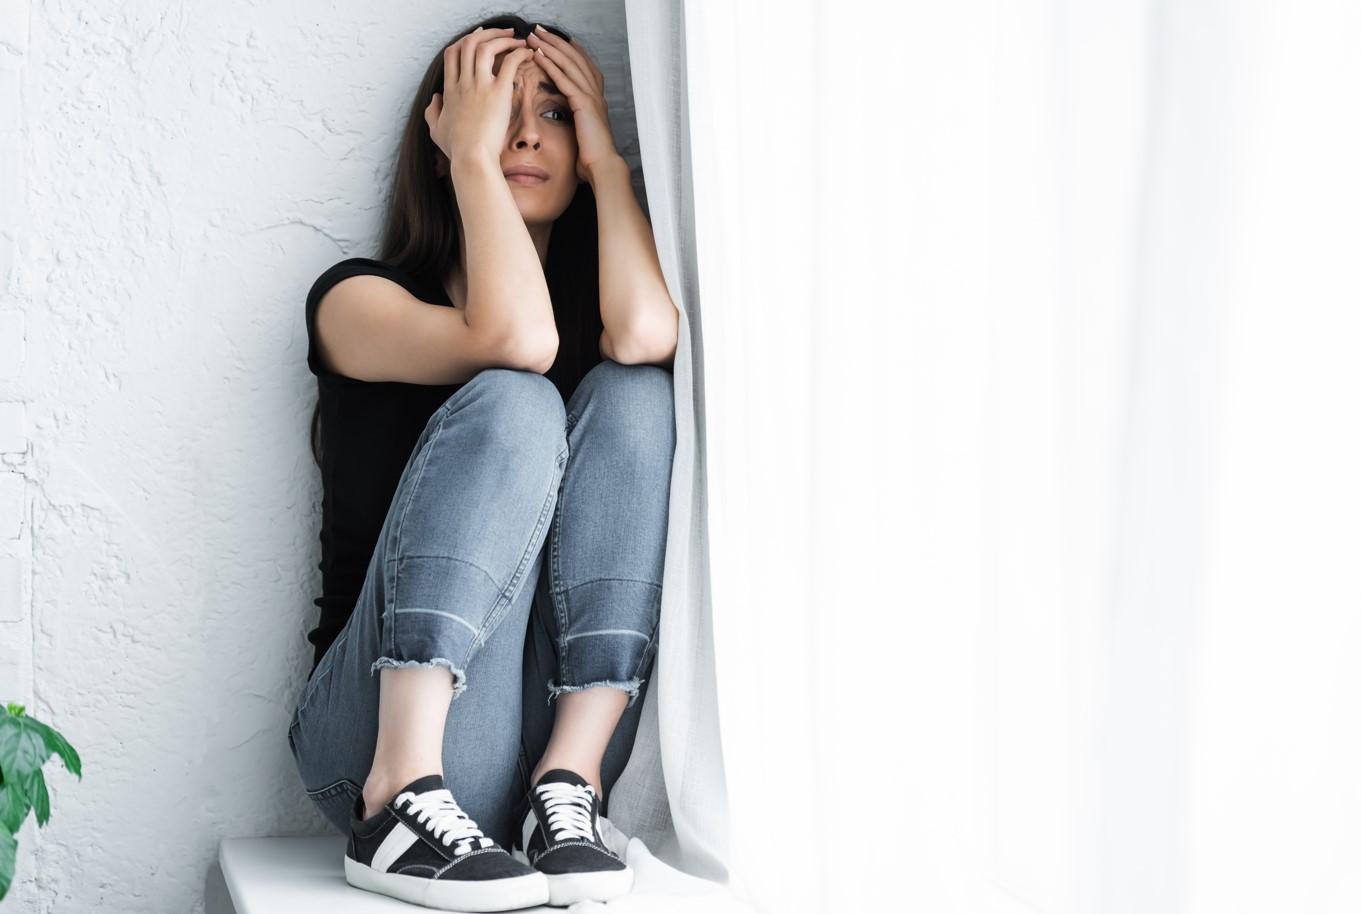 Panikstörung, Hilfe mit Selfapy